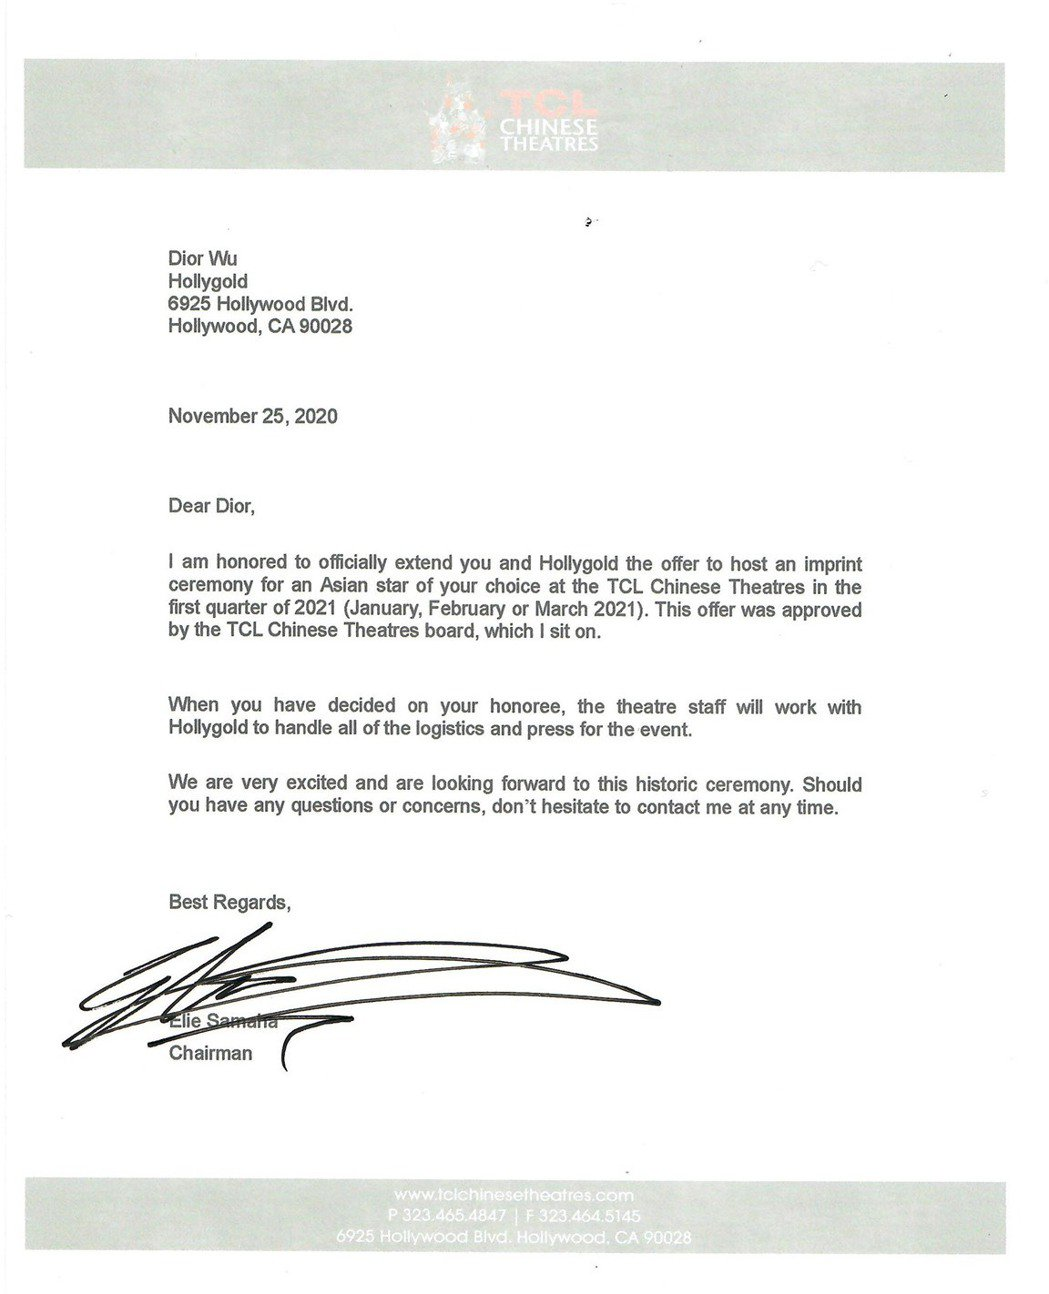 TCL中國戲院主席Elie Samaha簽授權書給HollyGold,推選大中華...